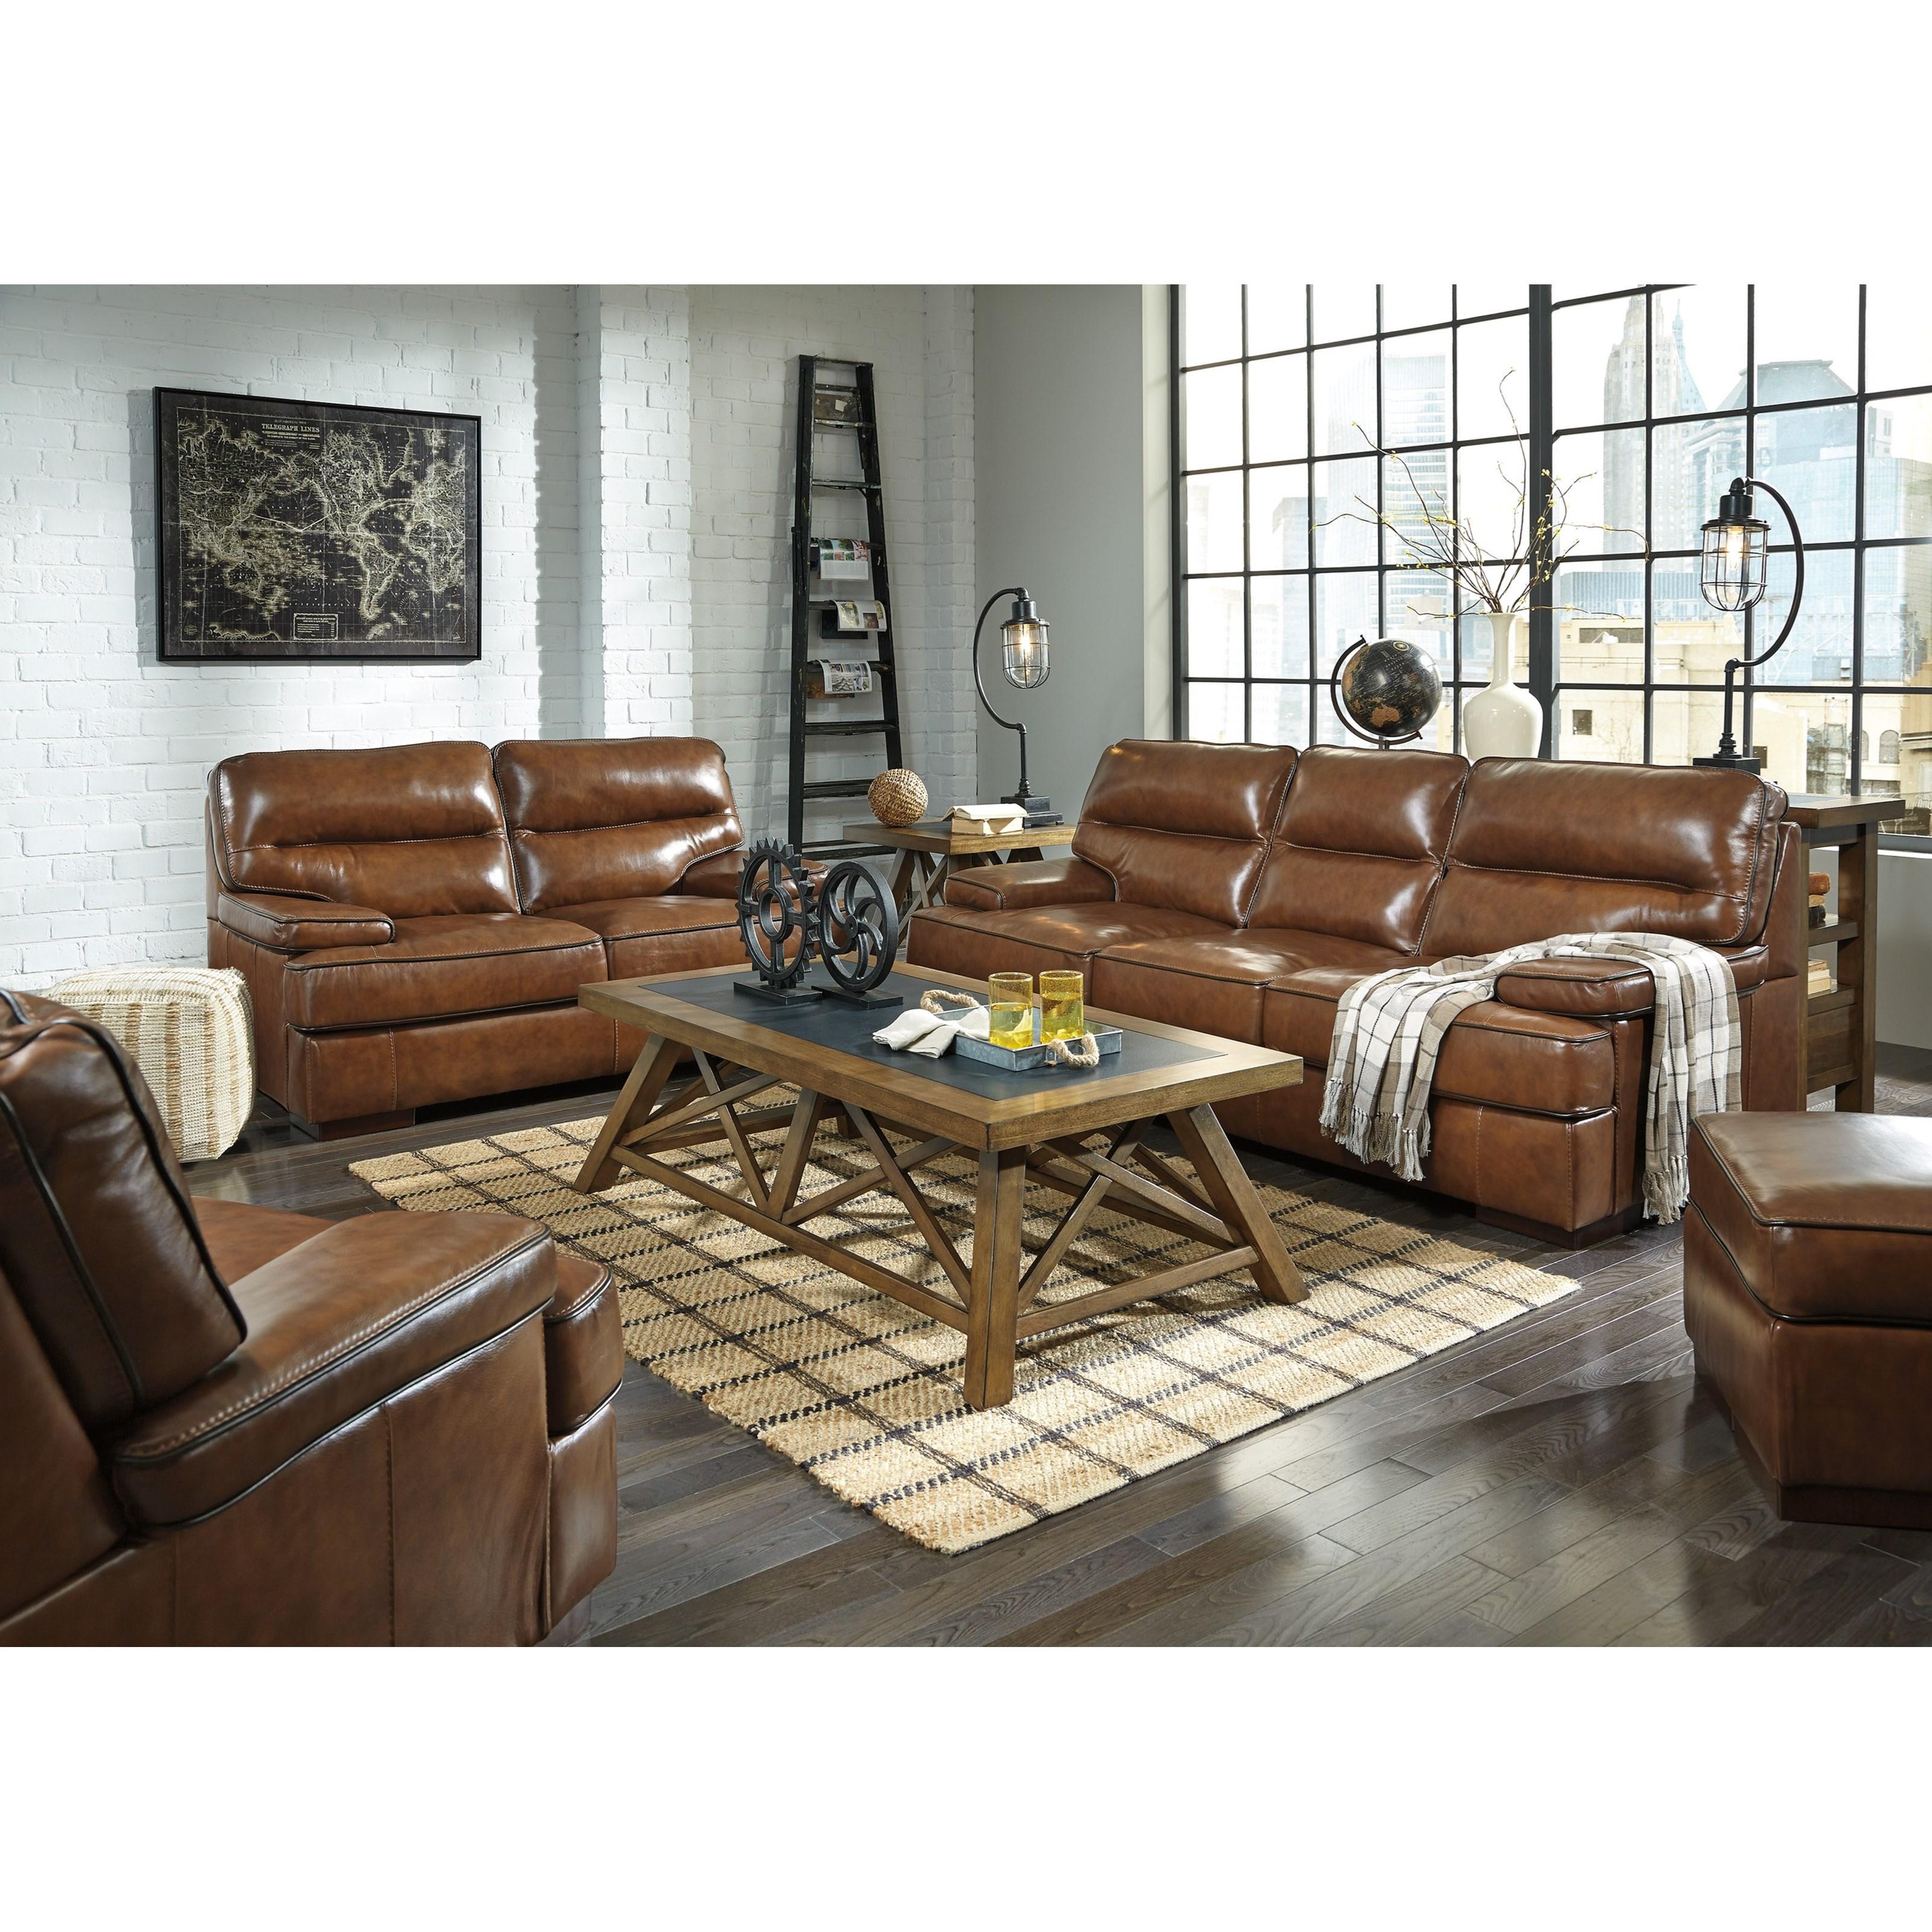 Signature Design By Ashley Palner Stationary Living Room Group Olinde 39 S Furniture Stationary